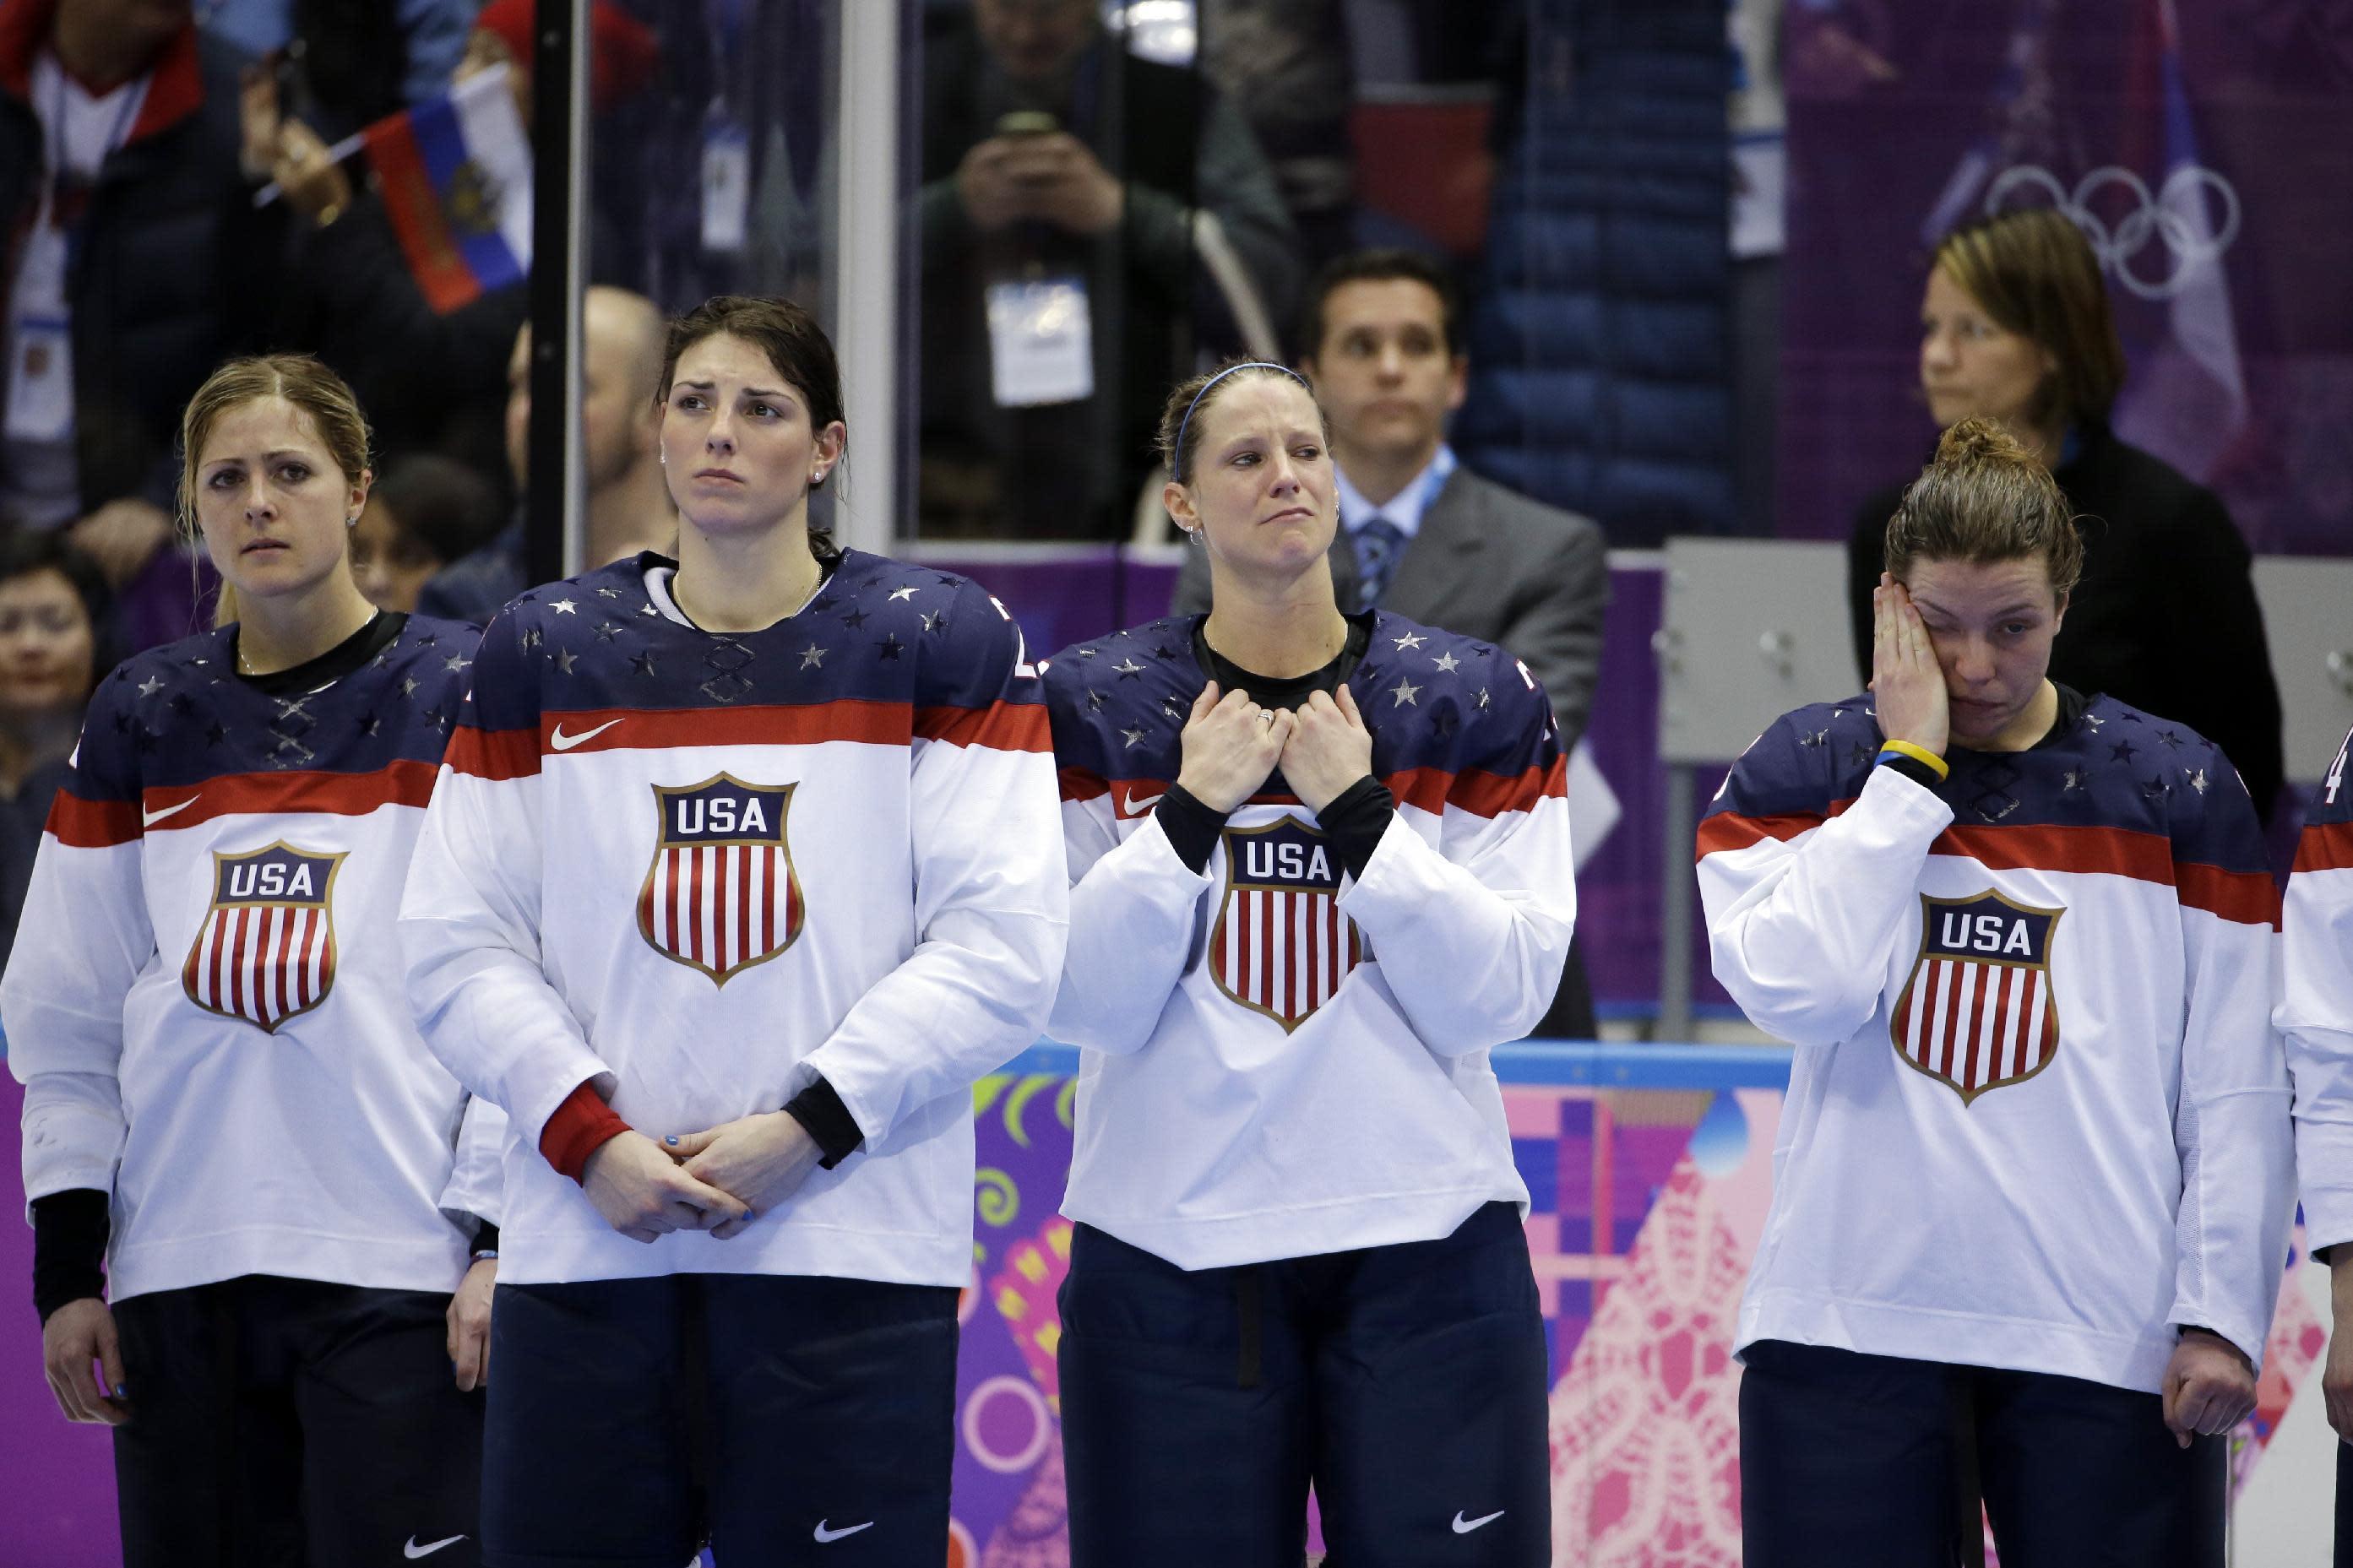 womens hockey team opened - HD2786×1857